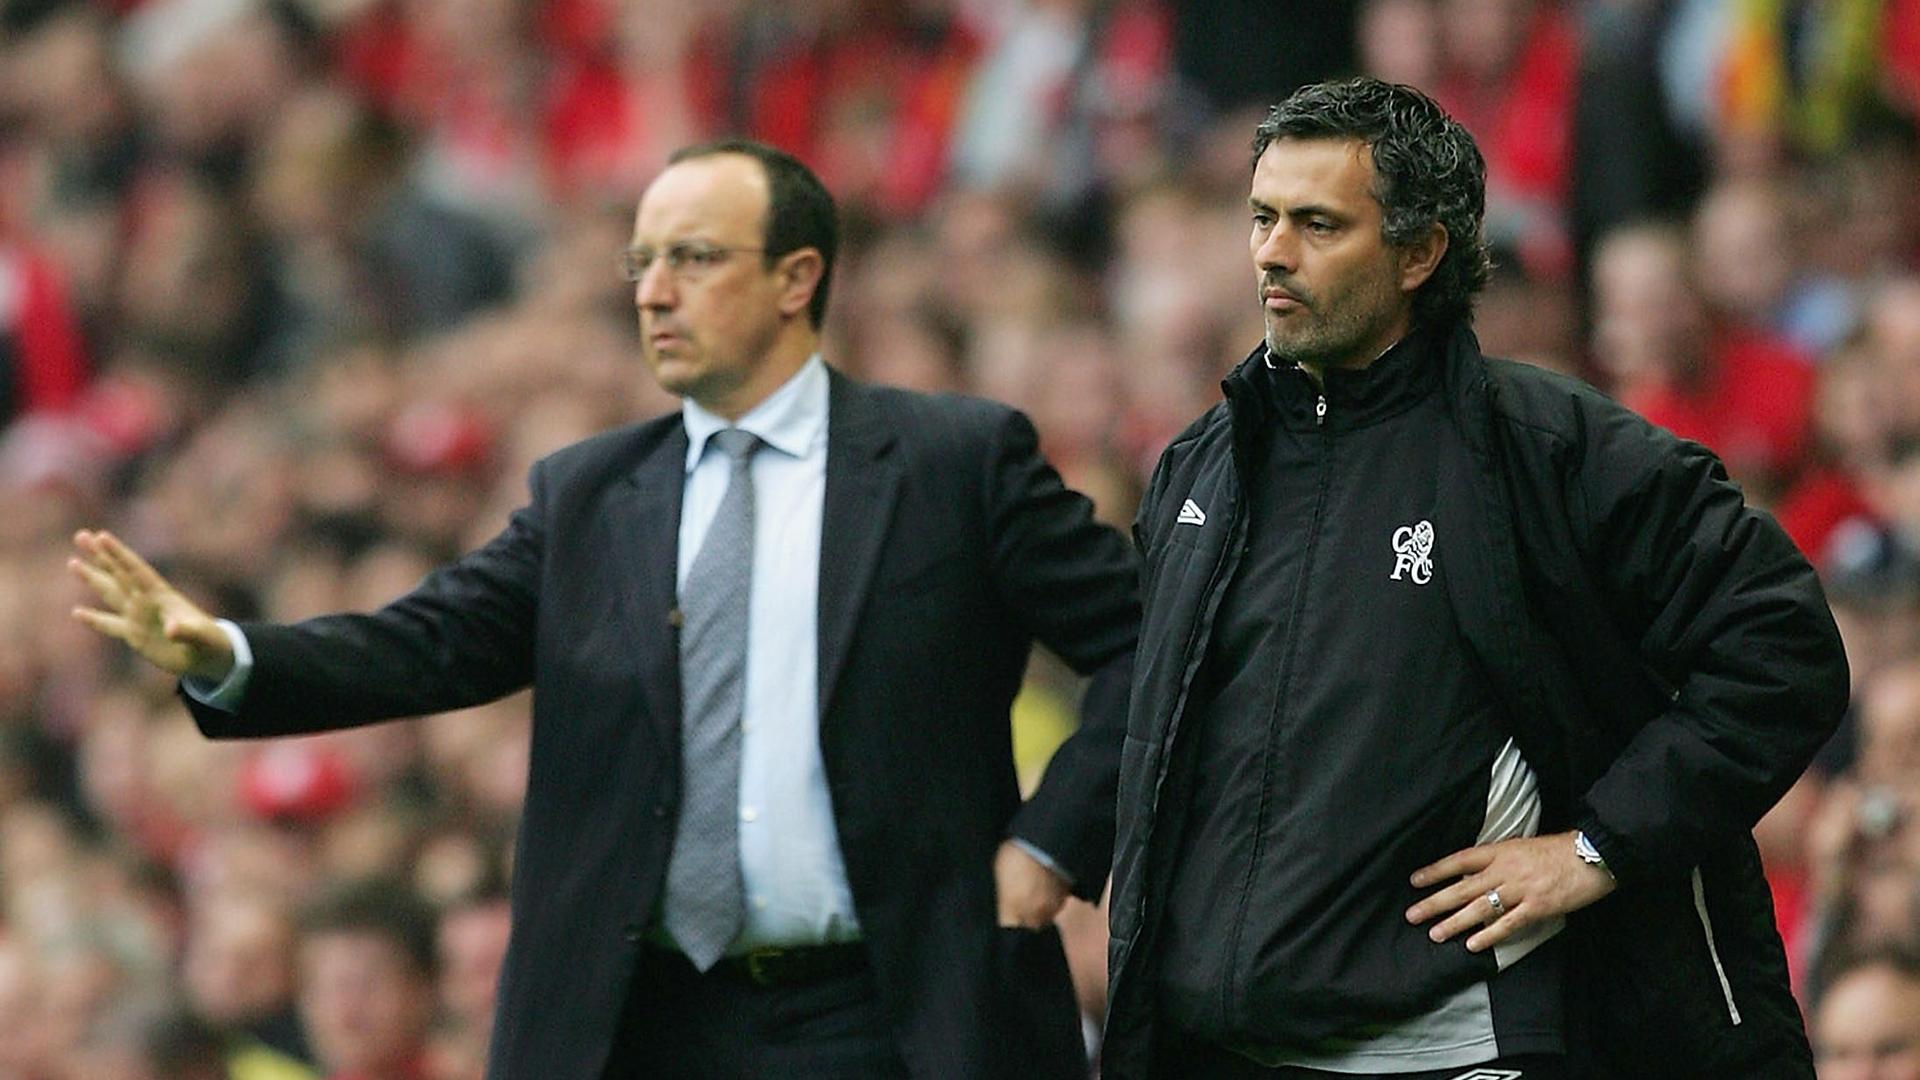 Jose Mourinho Rafael Benitez Champions League 2005